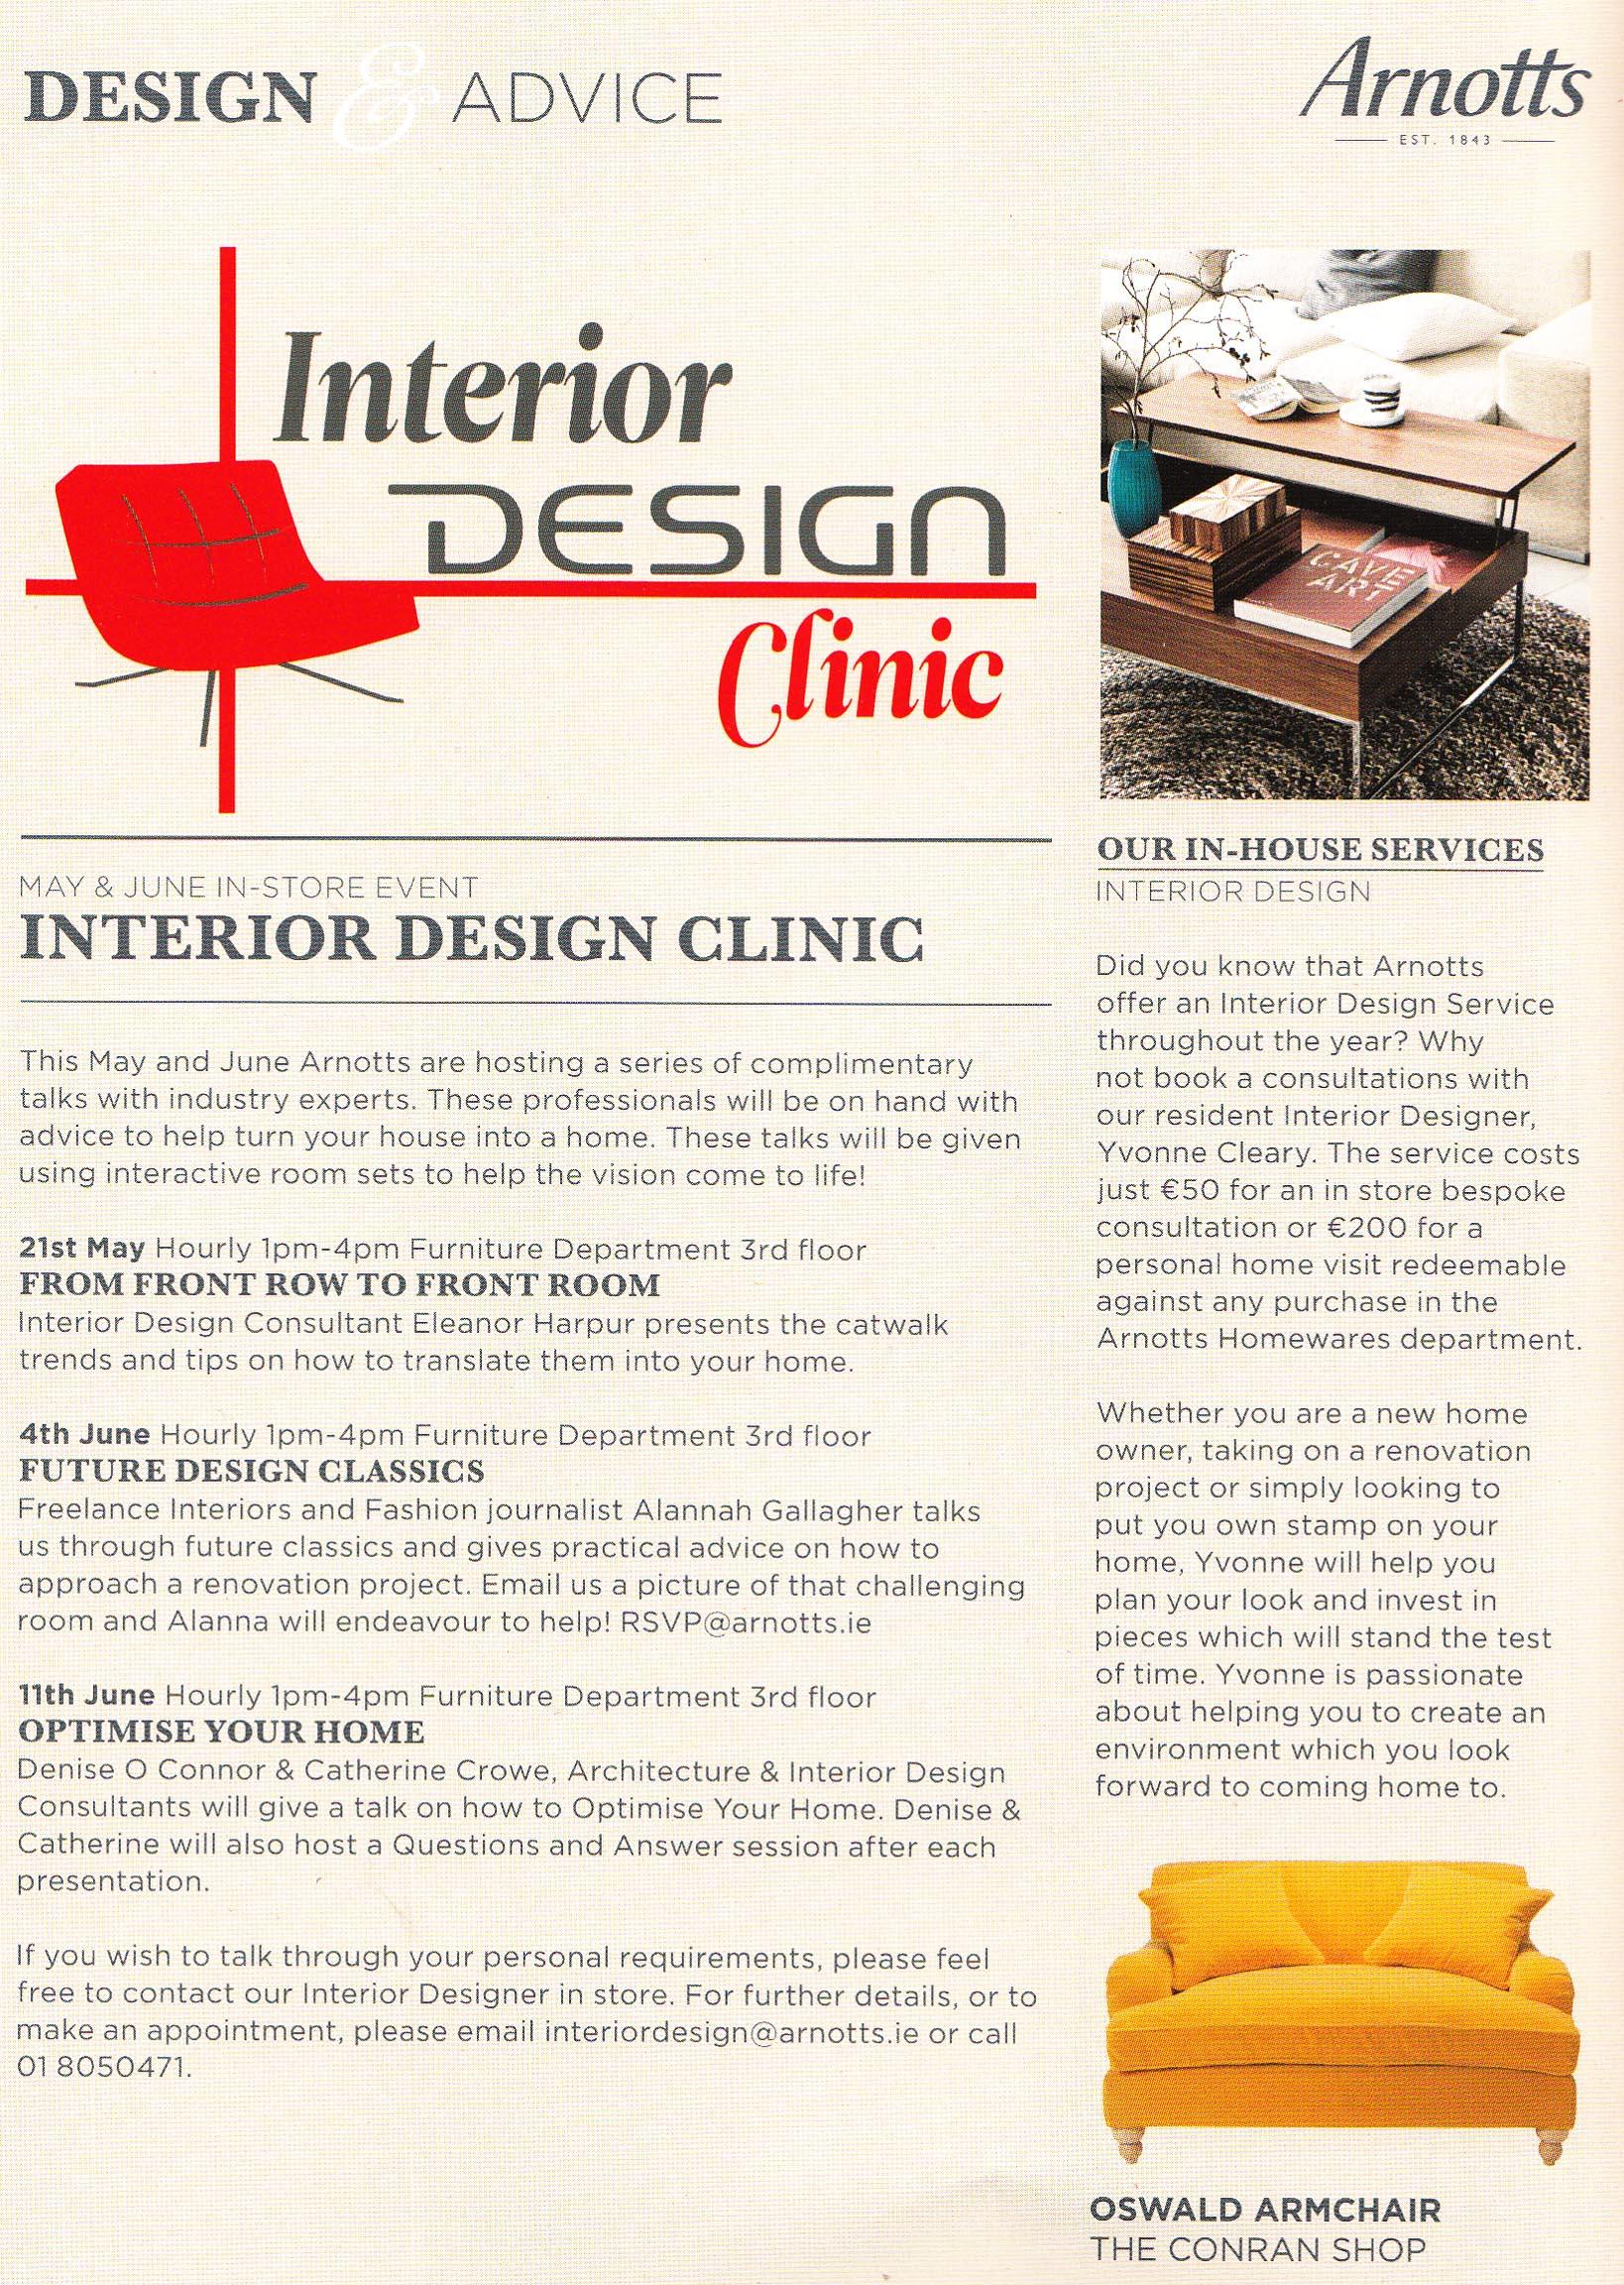 The Optimise Design Blog | Architecture, Interior Design U0026 Project  Management | Page 20